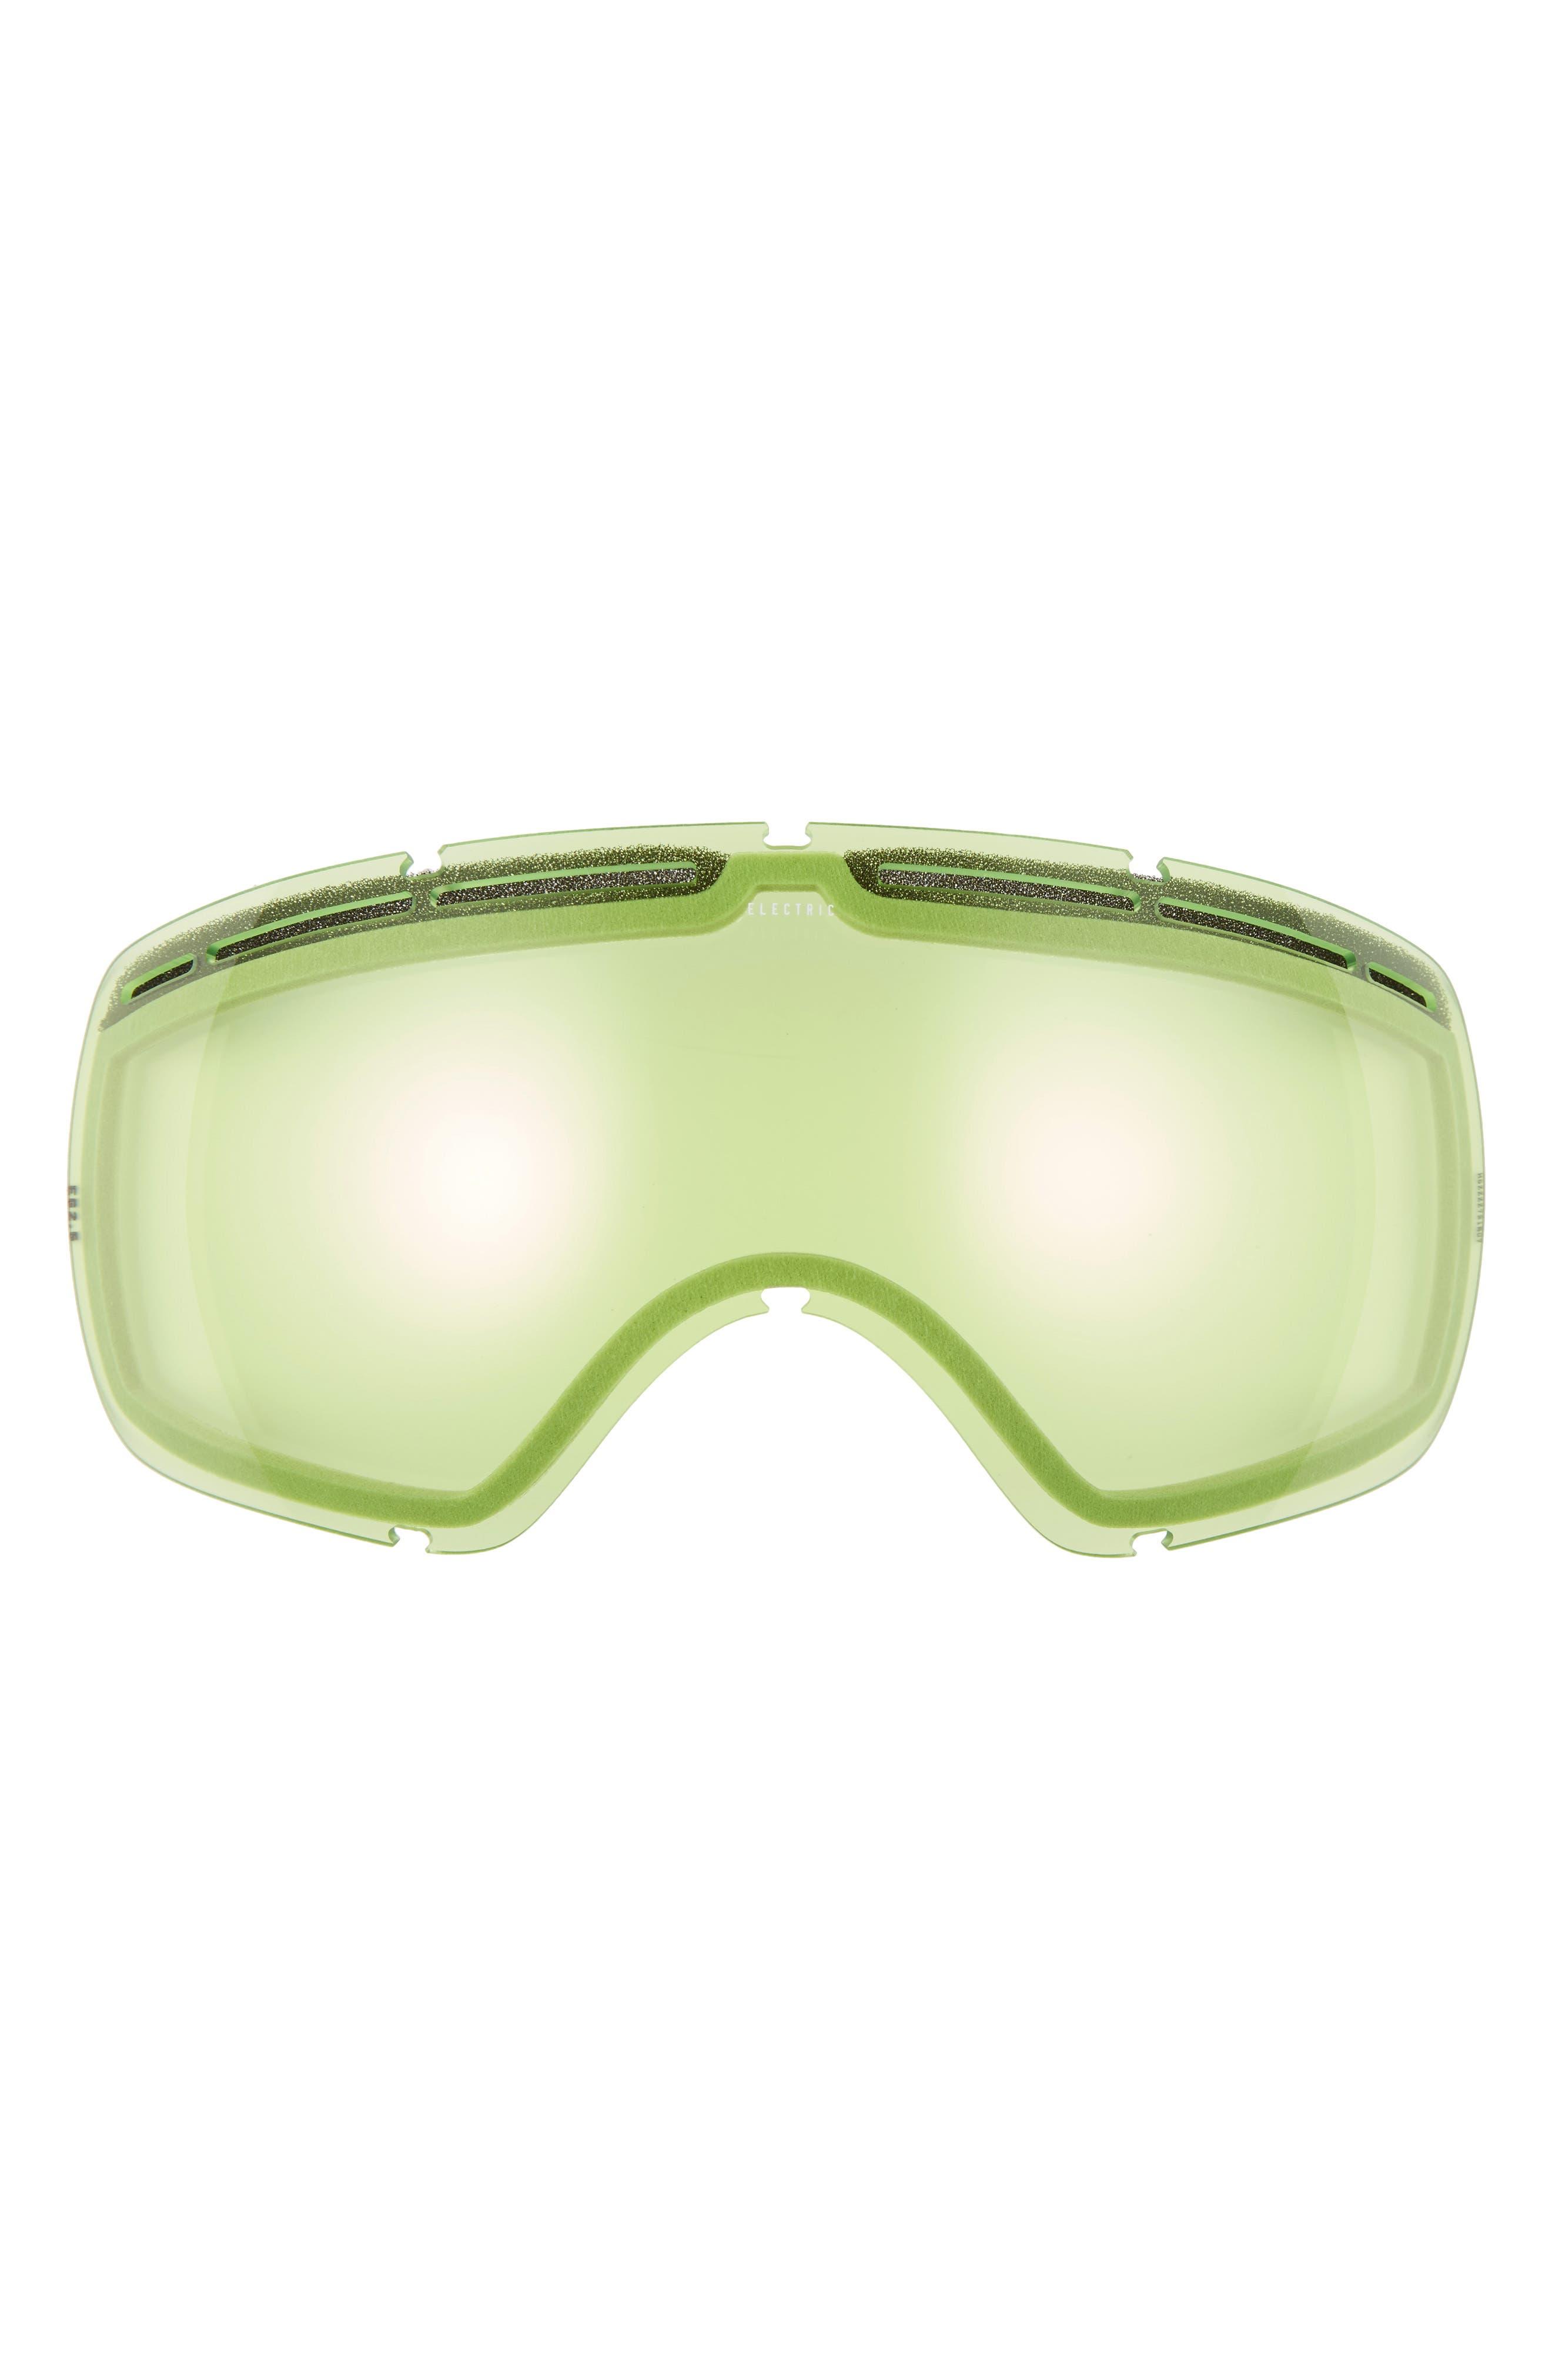 EG 2.5 215mm Snow Goggles,                             Alternate thumbnail 18, color,